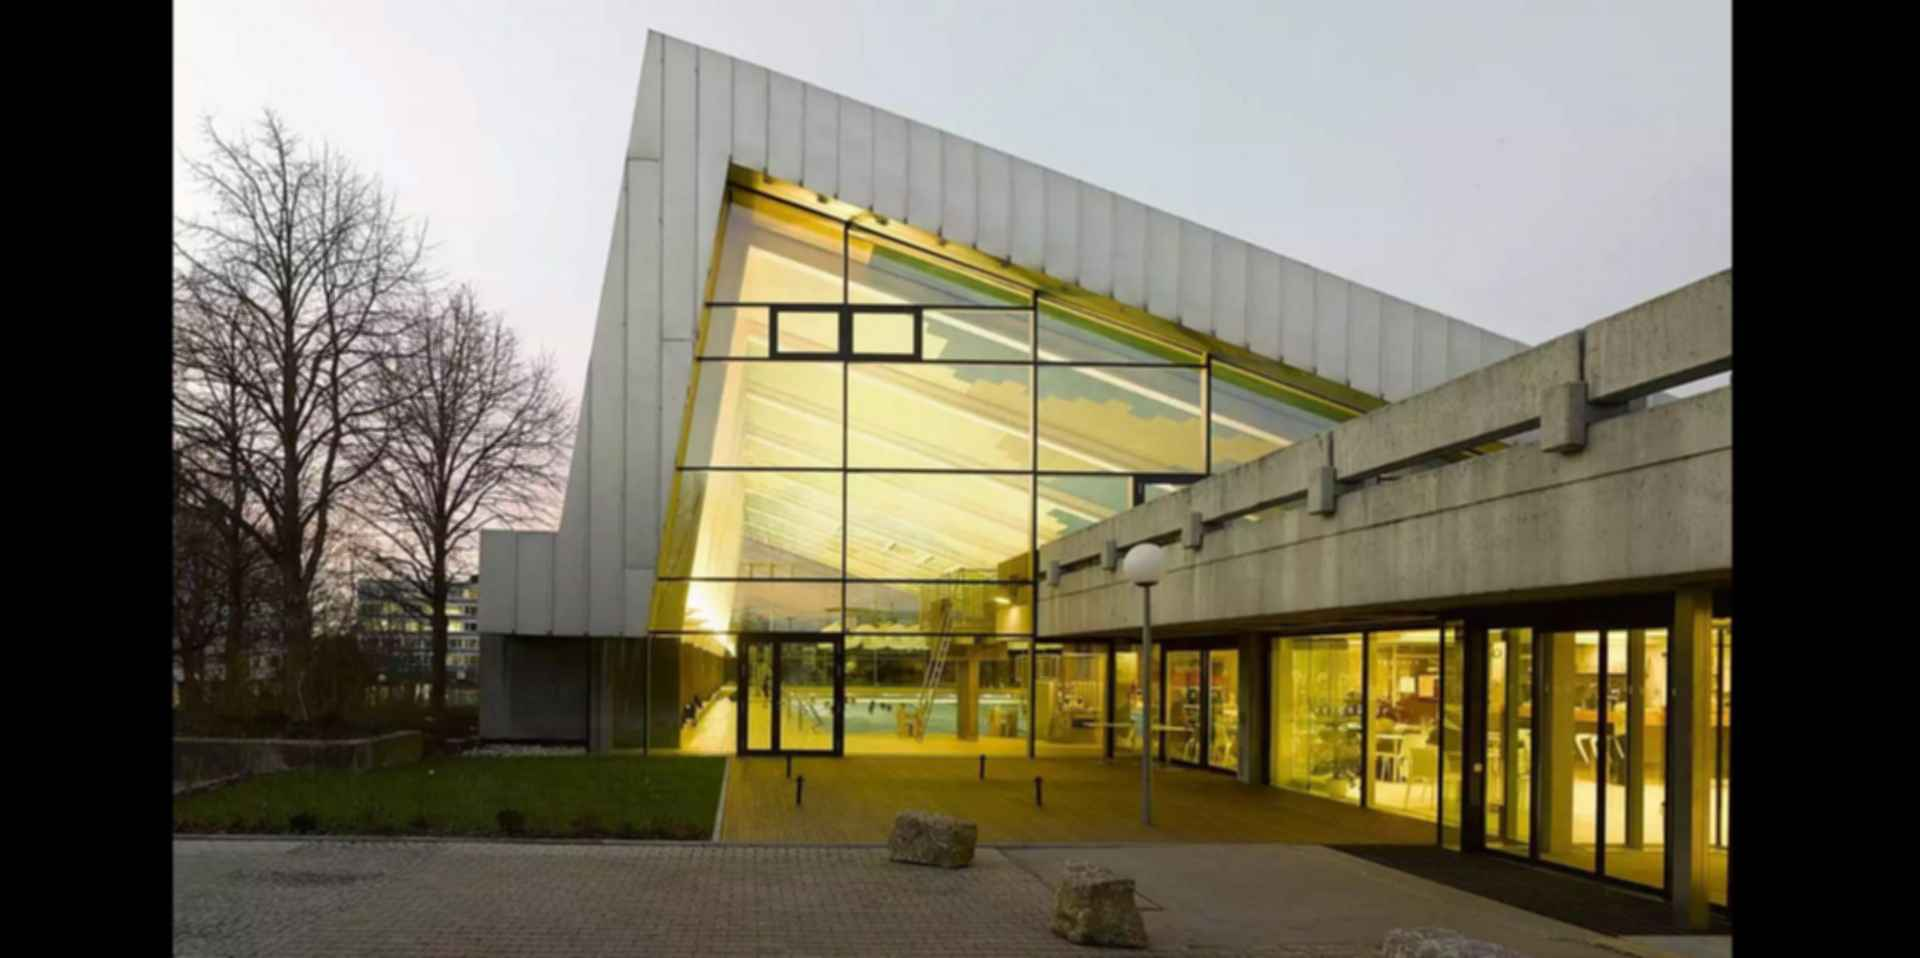 Sports Center in Leonberg - Exterior/Entrance